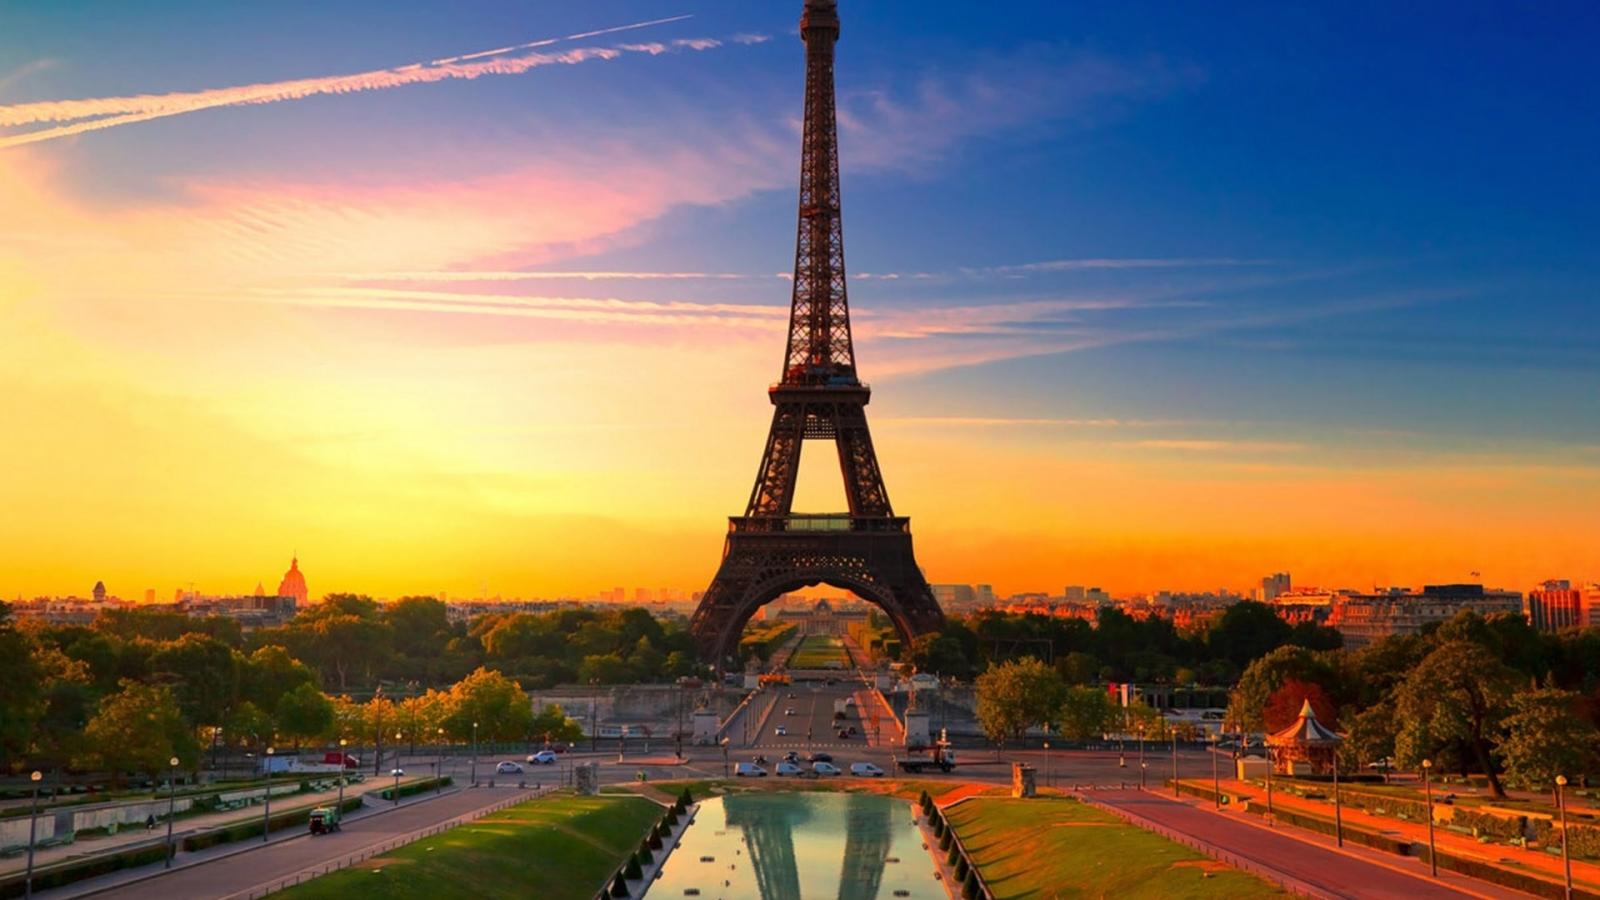 La torre Eiffel al atardecer - 1600x900